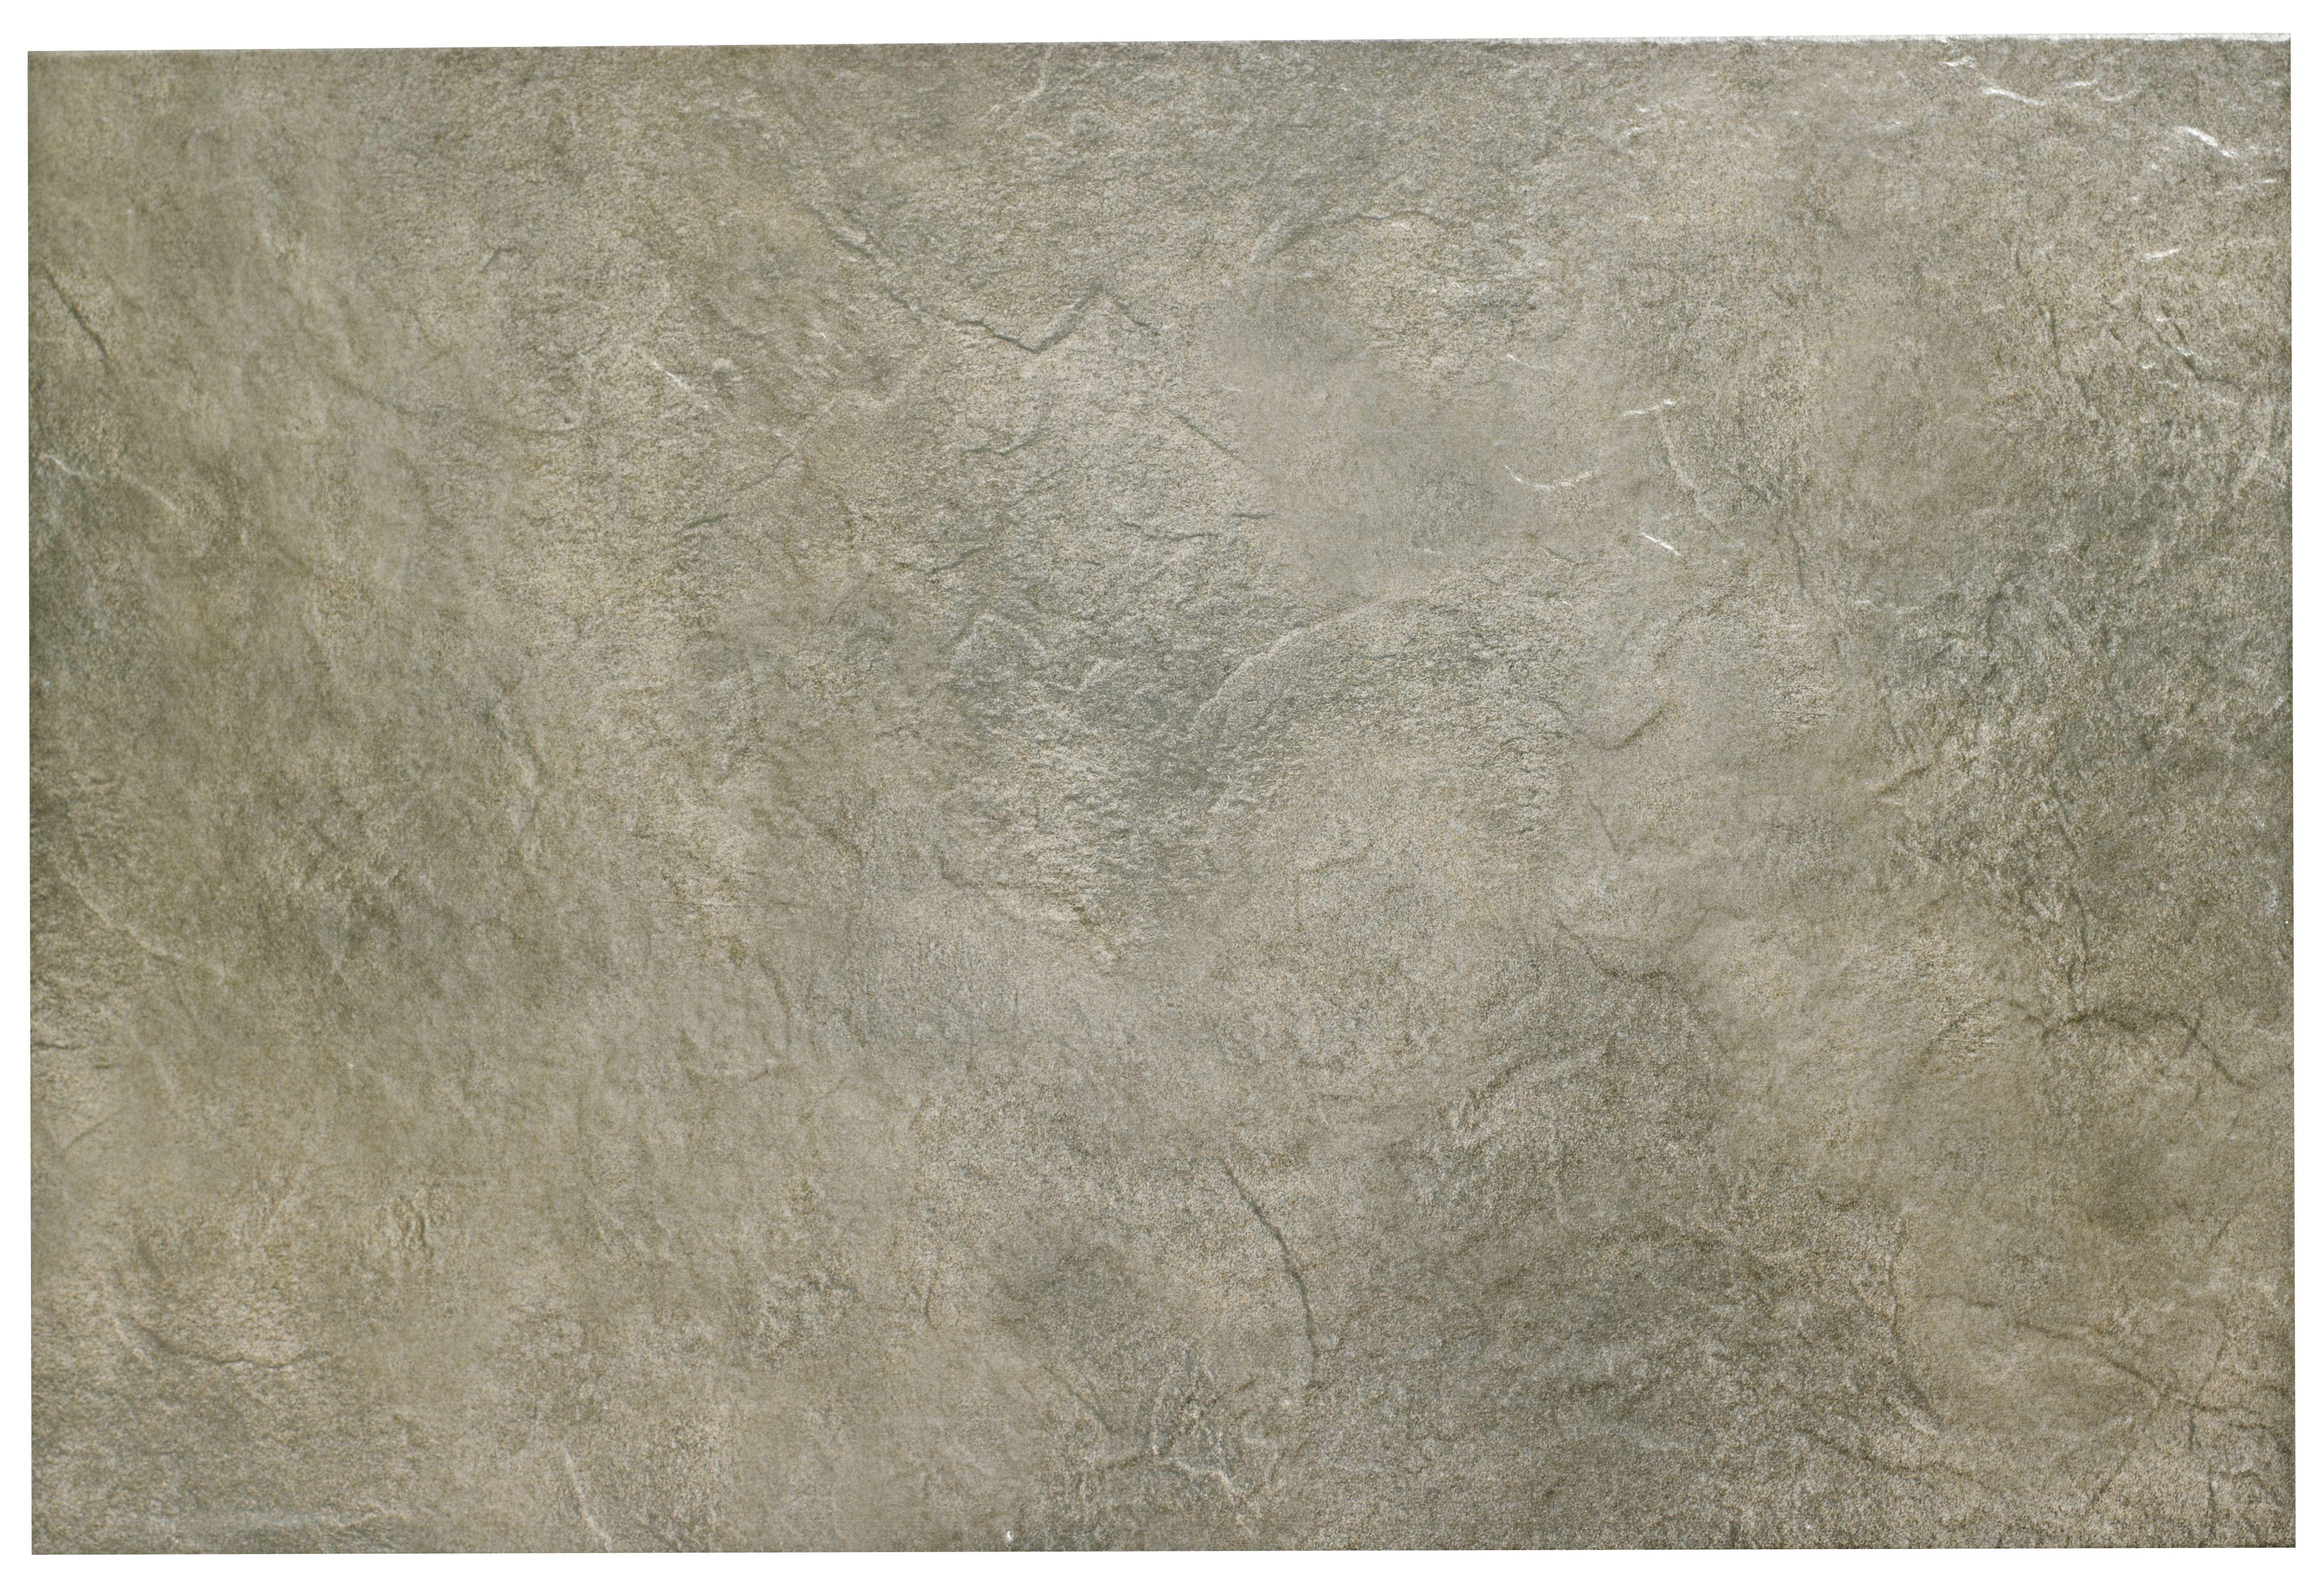 Jasper mocha stone effect porcelain wall floor tile pack of 5 jasper mocha stone effect porcelain wall floor tile pack of 5 l600mm w400mm departments diy at bq dailygadgetfo Gallery